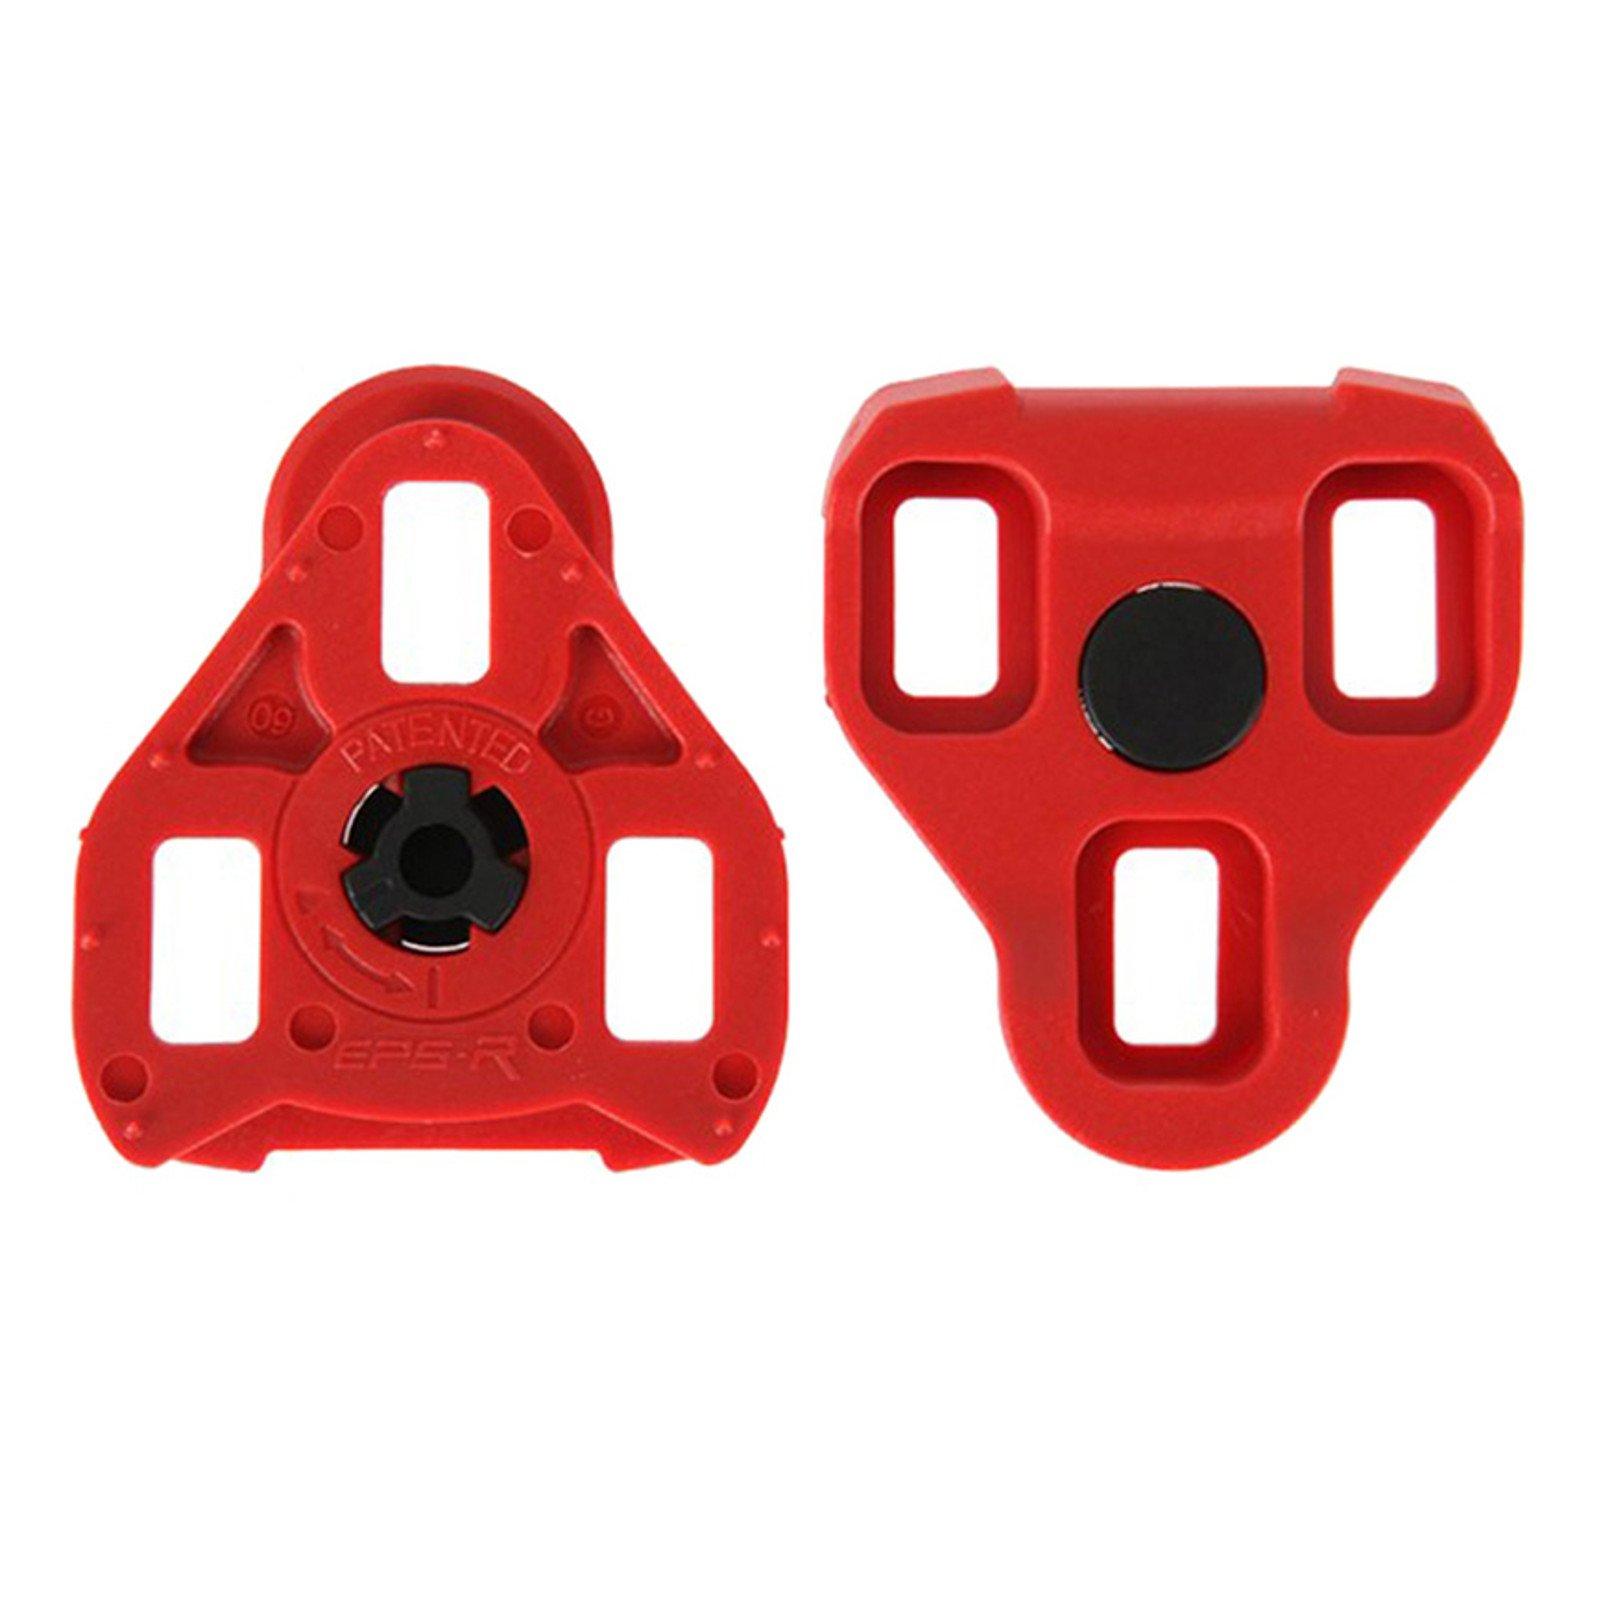 Black//Red Gear Pedal CRF150 07 On CRF250L 13/≫ On RFX FXGP 11202 99RD Pro Flex